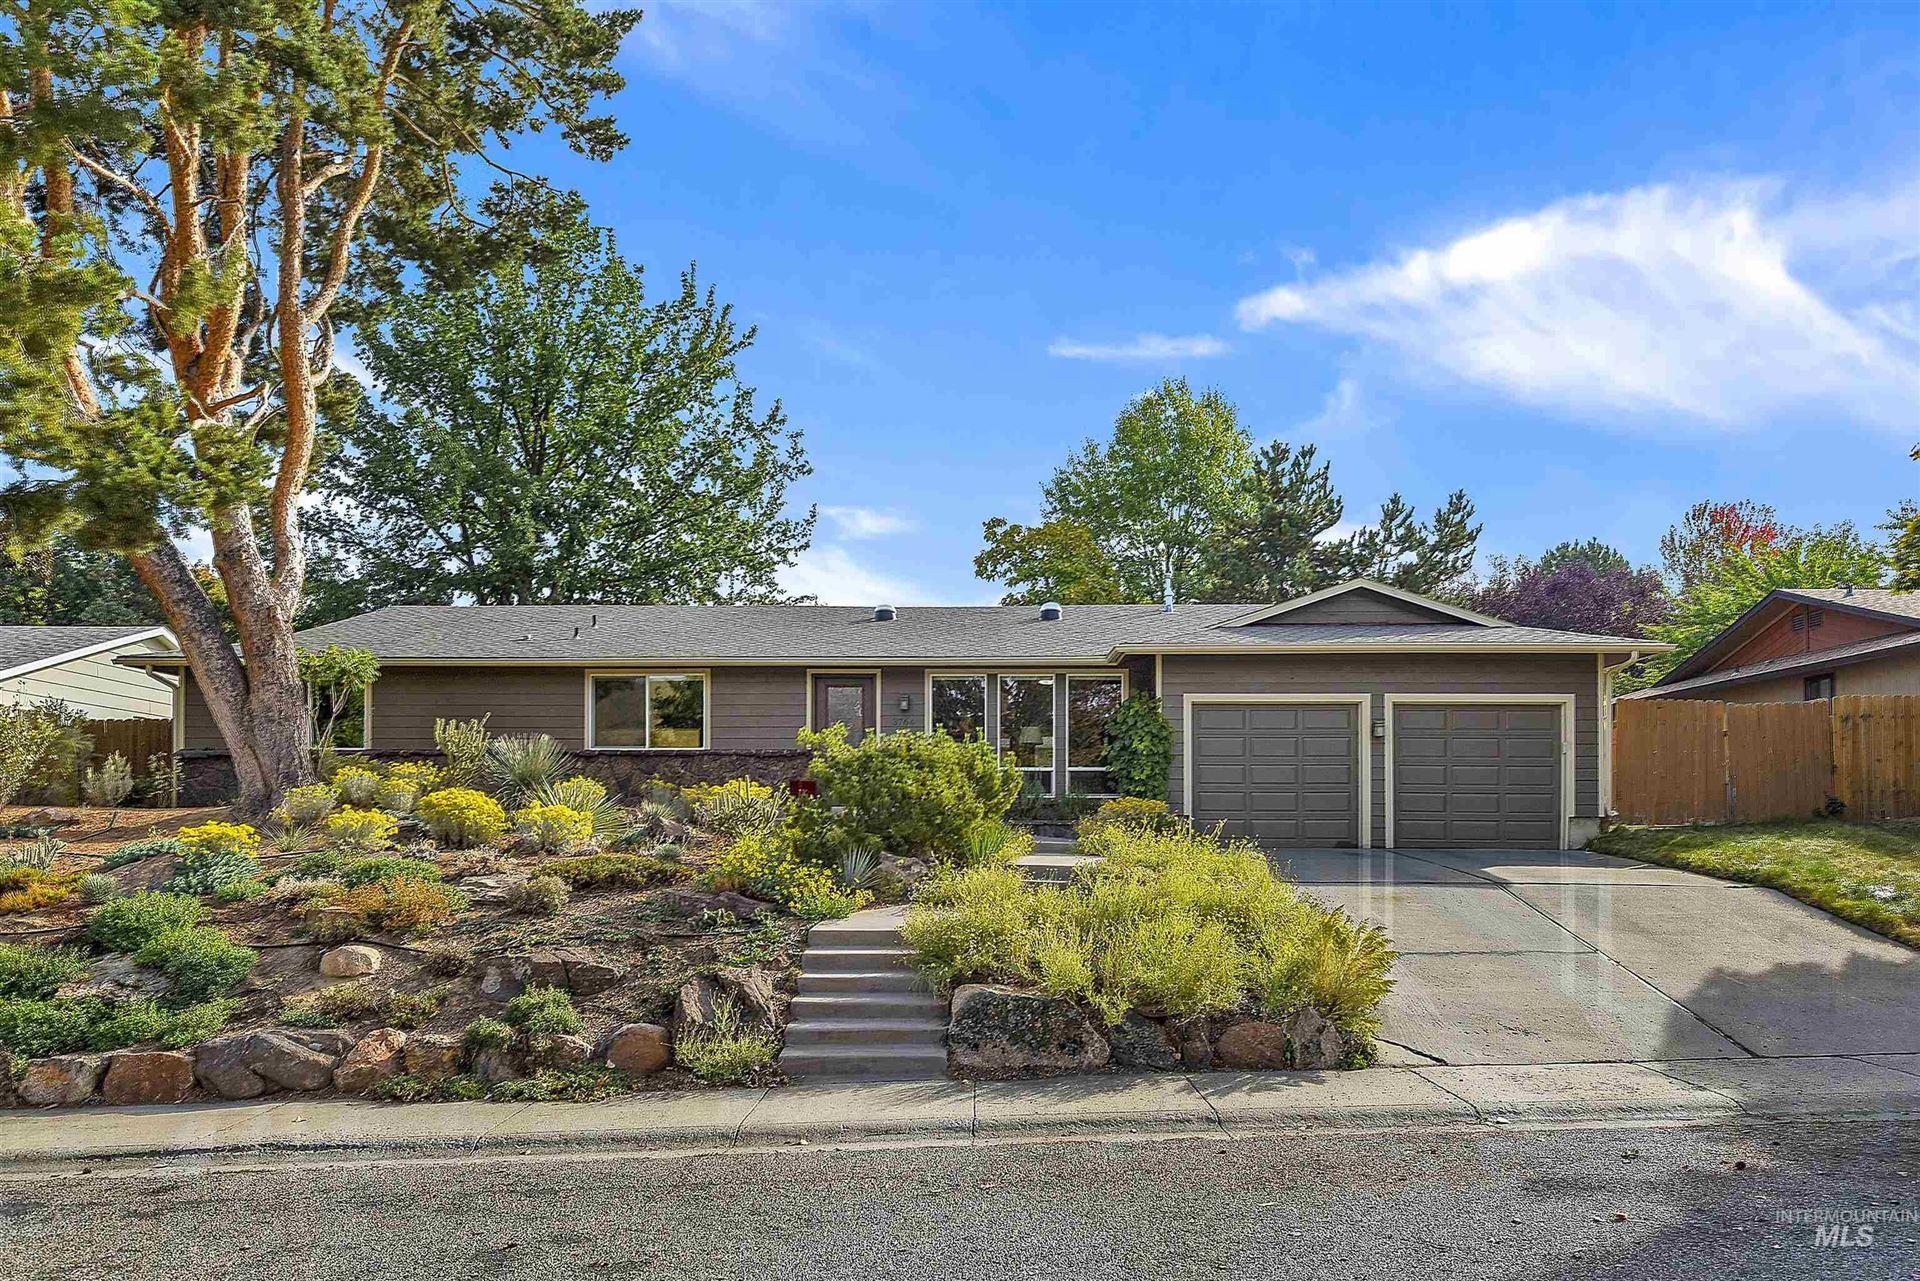 3764 N La Mesita Way, Boise, ID 83702 - MLS#: 98821898